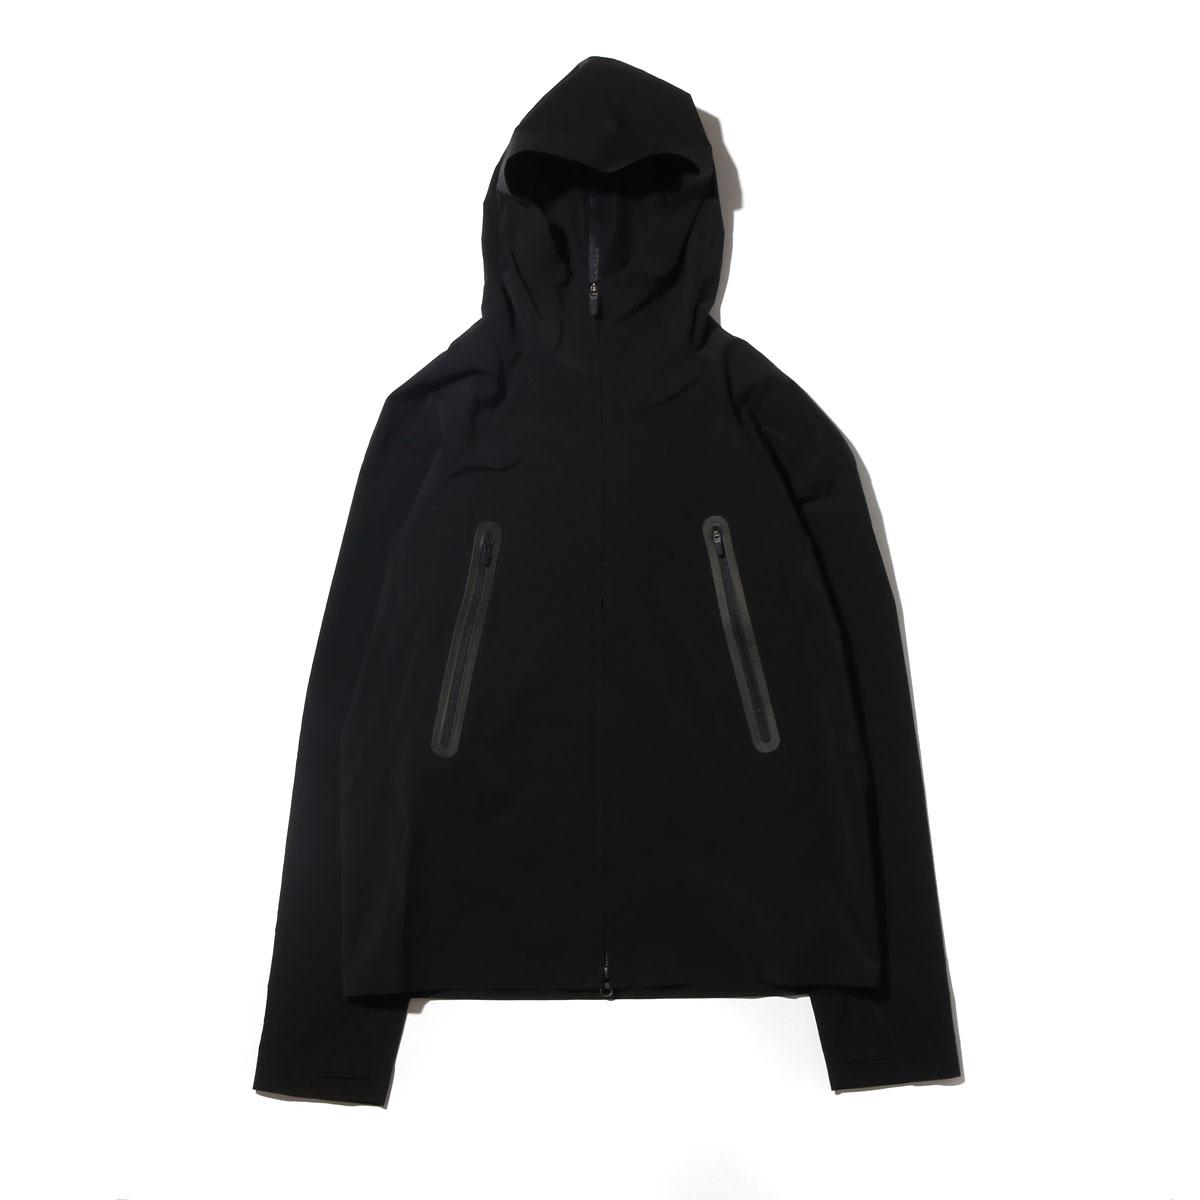 DESCENTE PRIMEFLEX STRETCH JACKET (デサント プライムフレックス ストレッチ ジャケット) BLACK【メンズ ジャケット】17FW-I